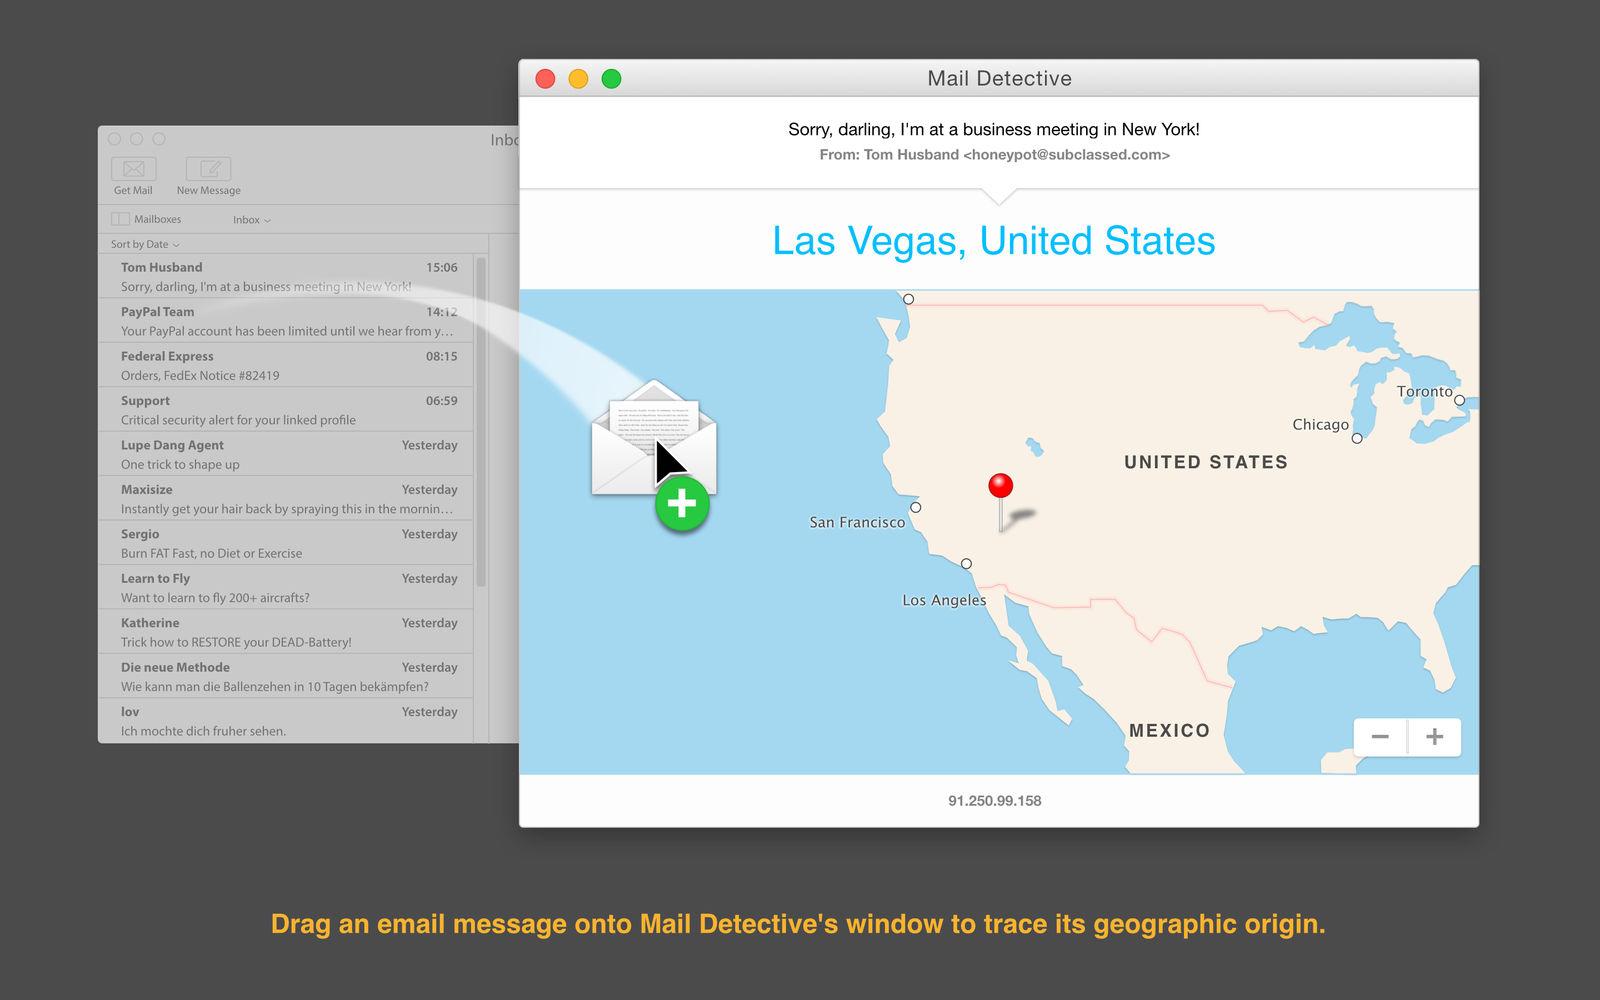 Mail Detective 1.3邮件探测发送地的软件